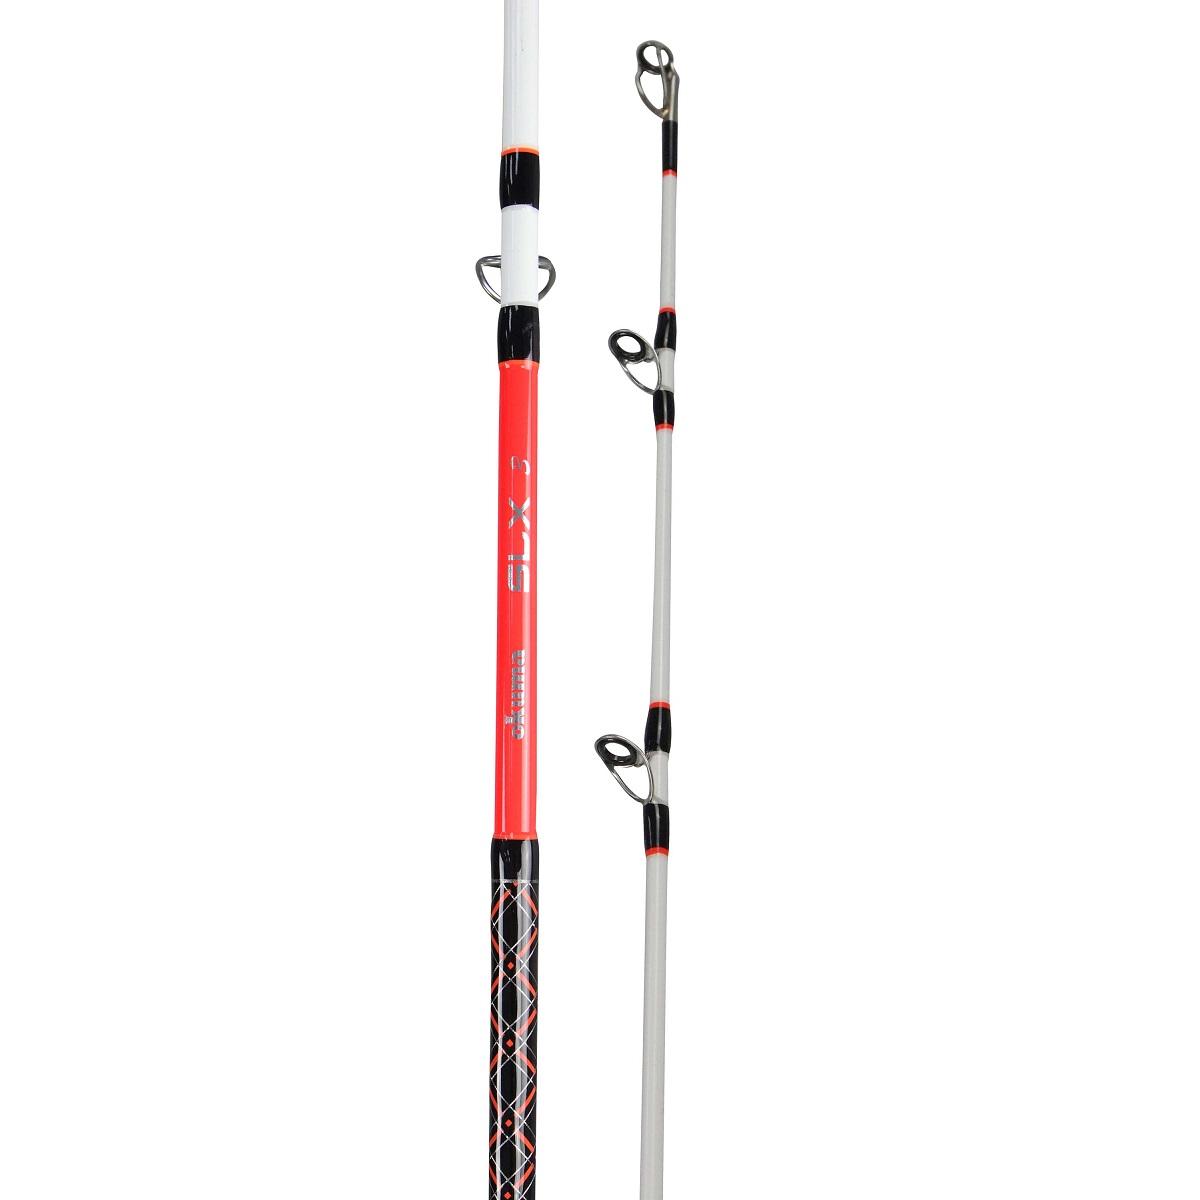 SLX Rod - SLX Rod